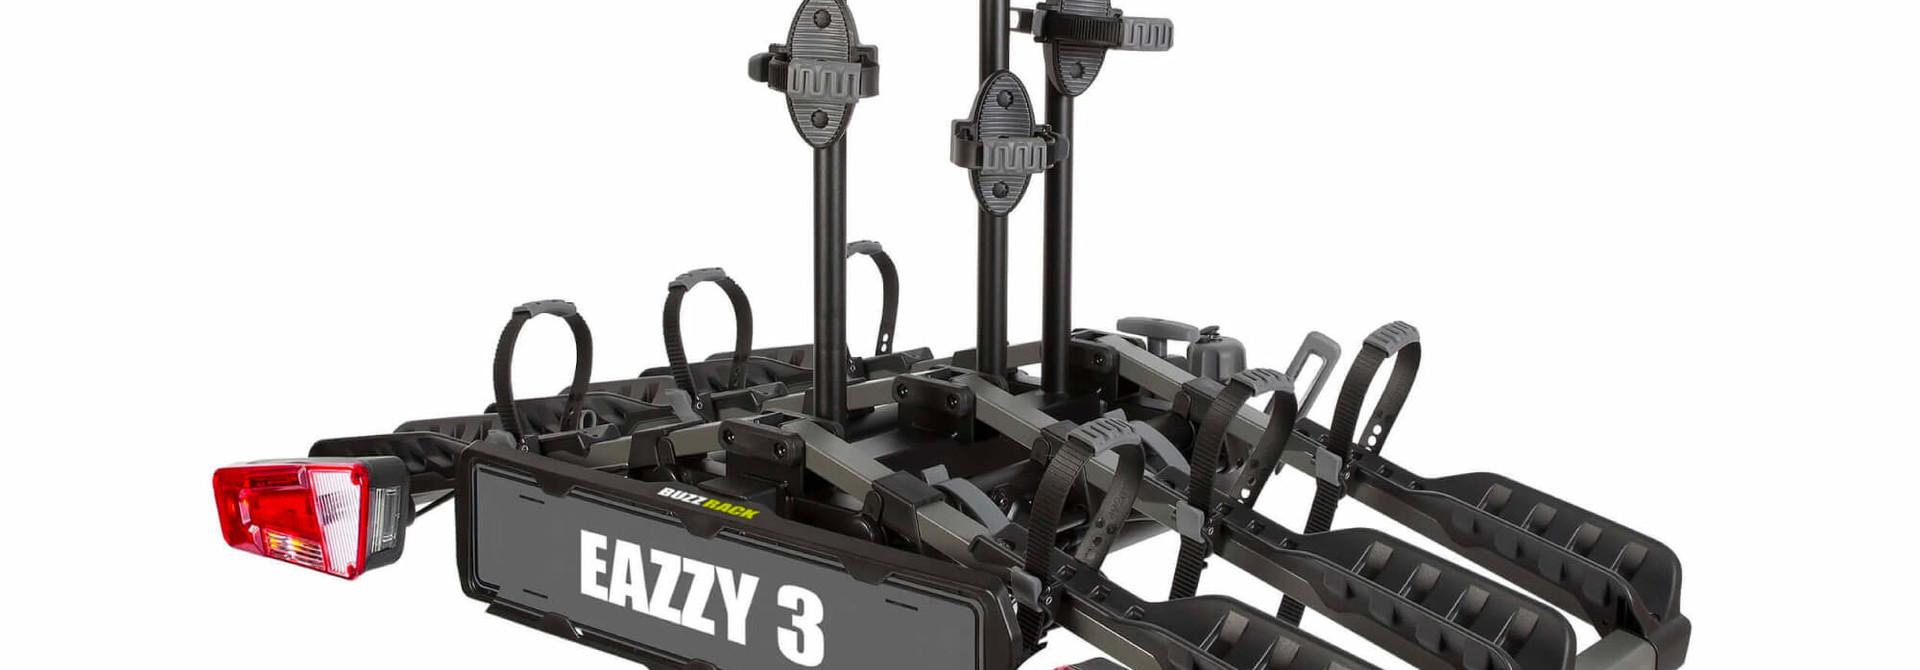 Eazzy 3 BikeTow Ball Mount Fold Platform Rack